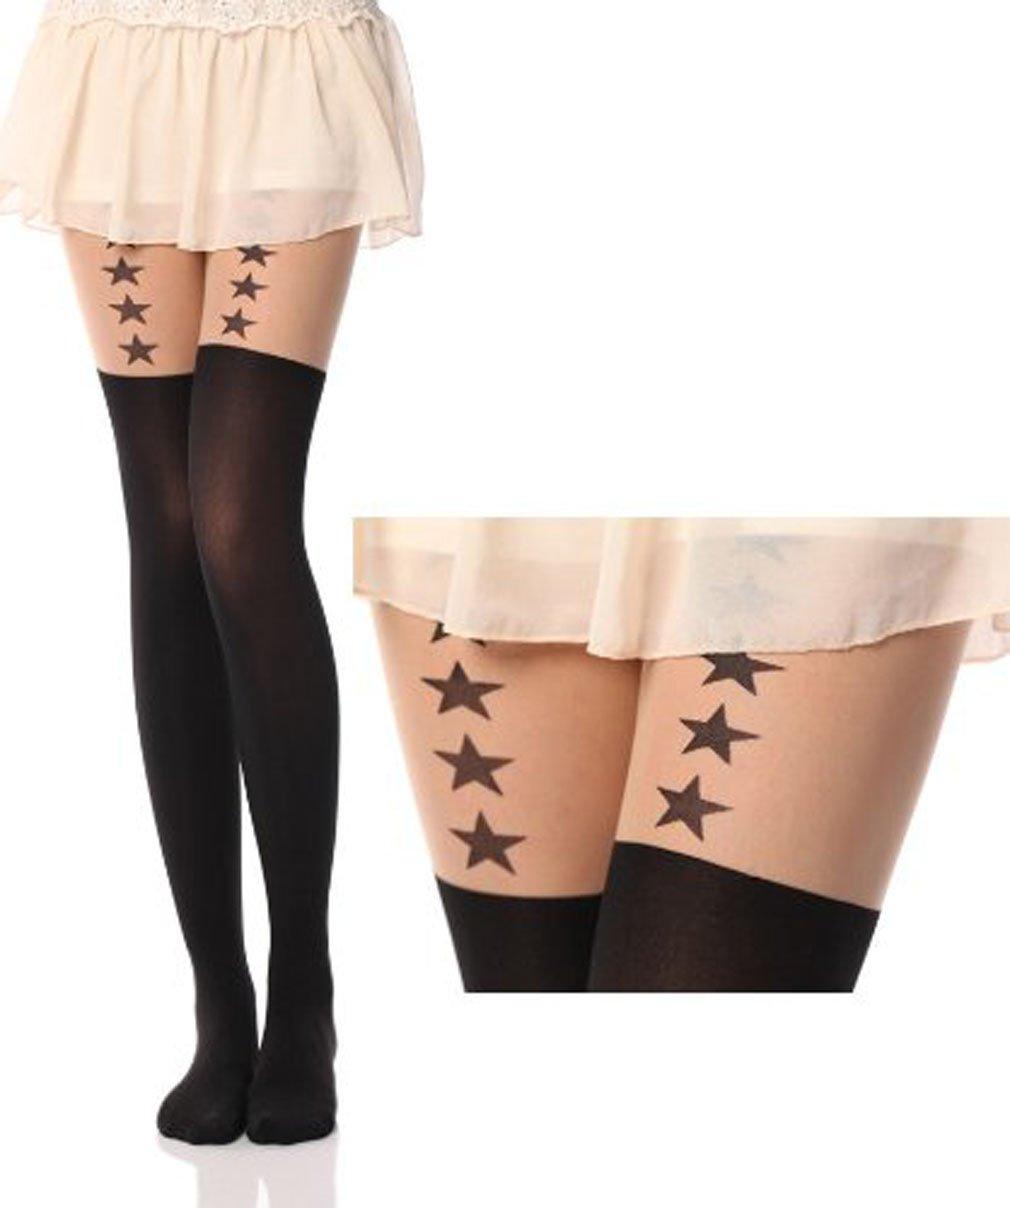 Women Cute Cat Bear Over Knee Socks Stocking Tight Hosiery Tattoo Pantyhose, Love